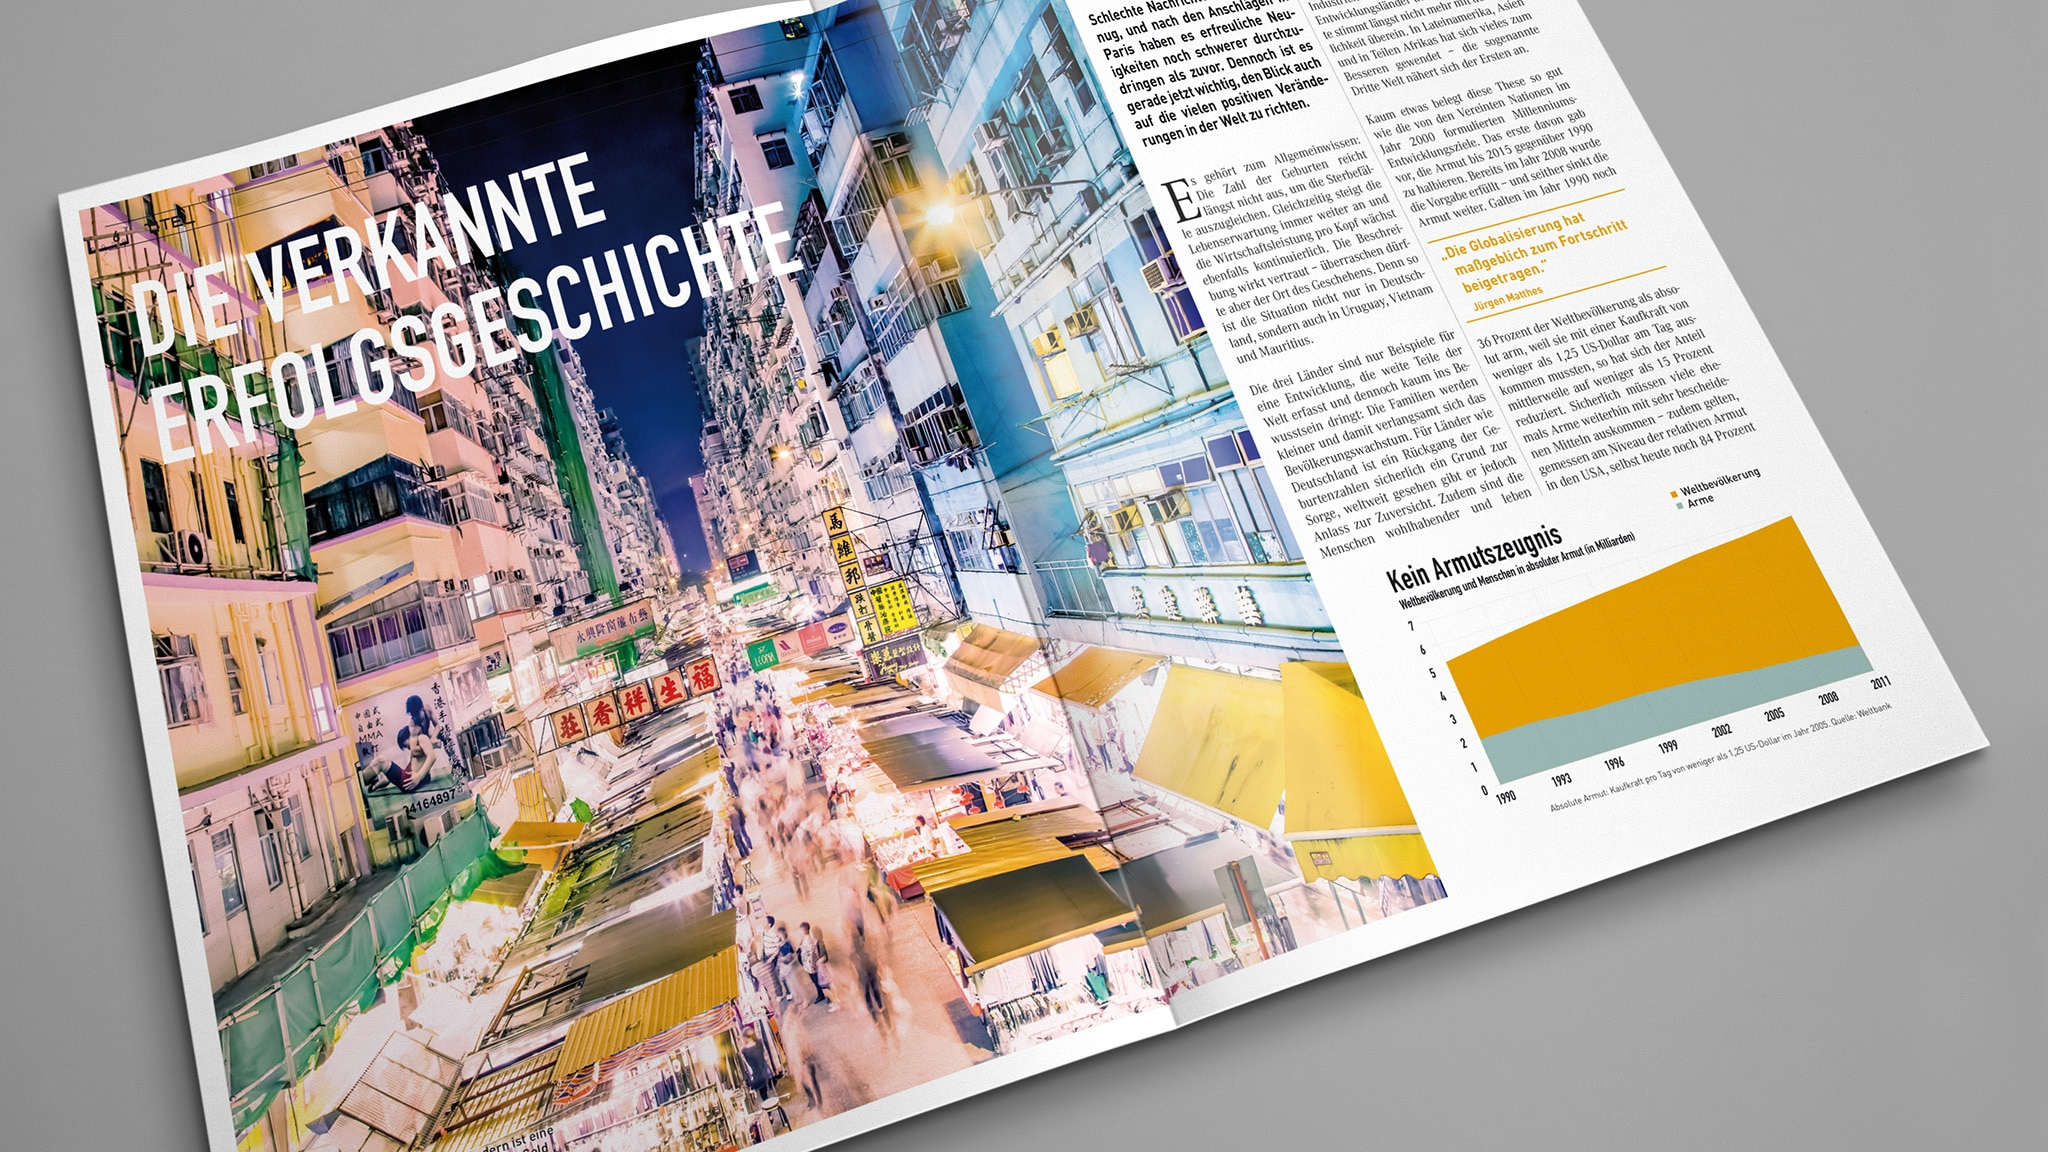 16_Magazin-21-Editorial-Design-11